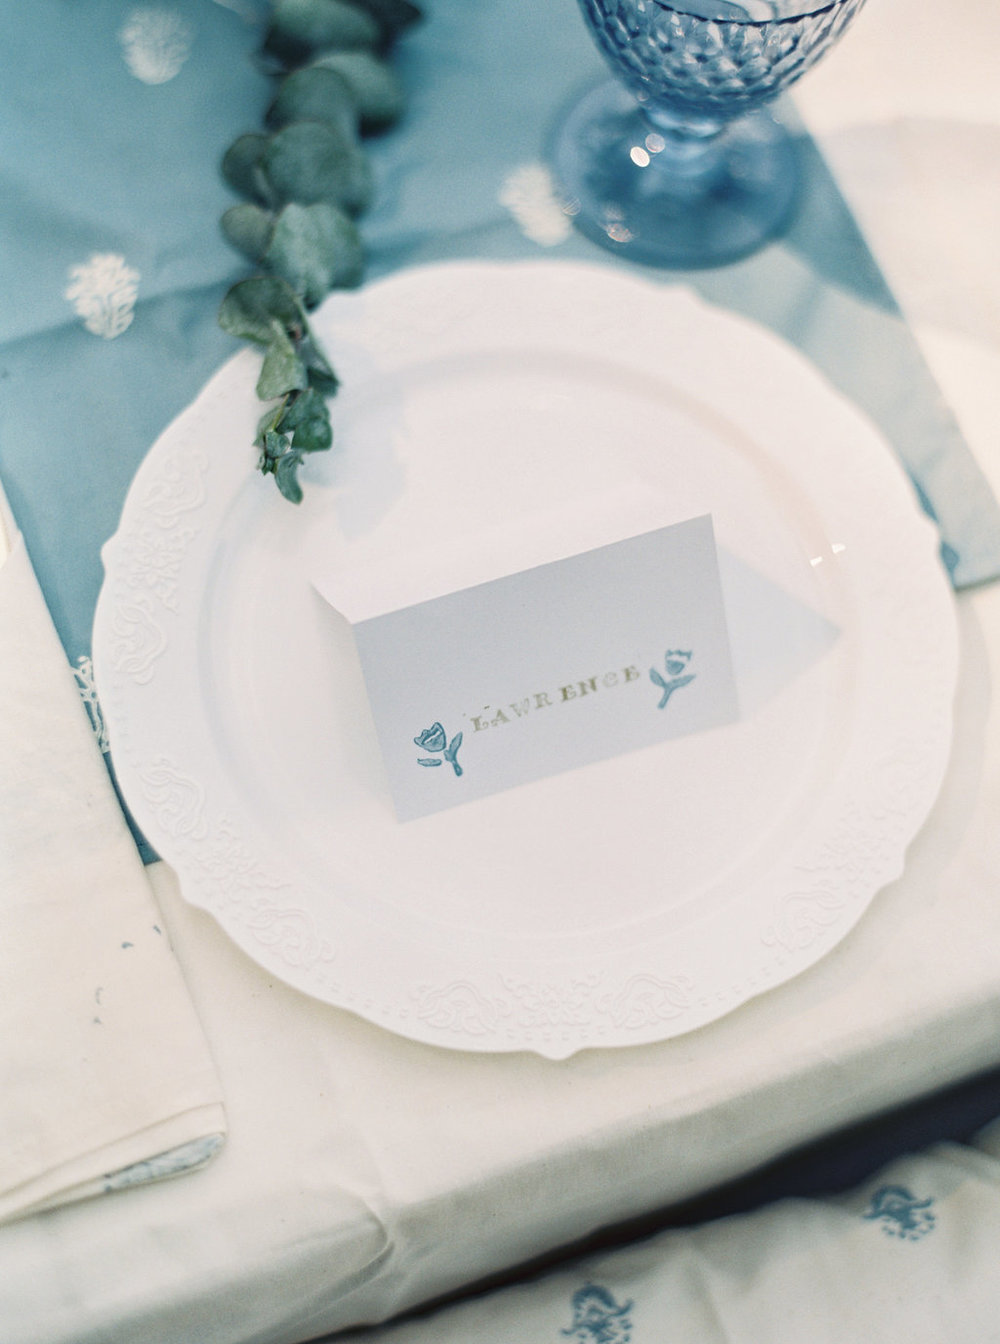 000035_gallardo_wedding_film0077.jpg